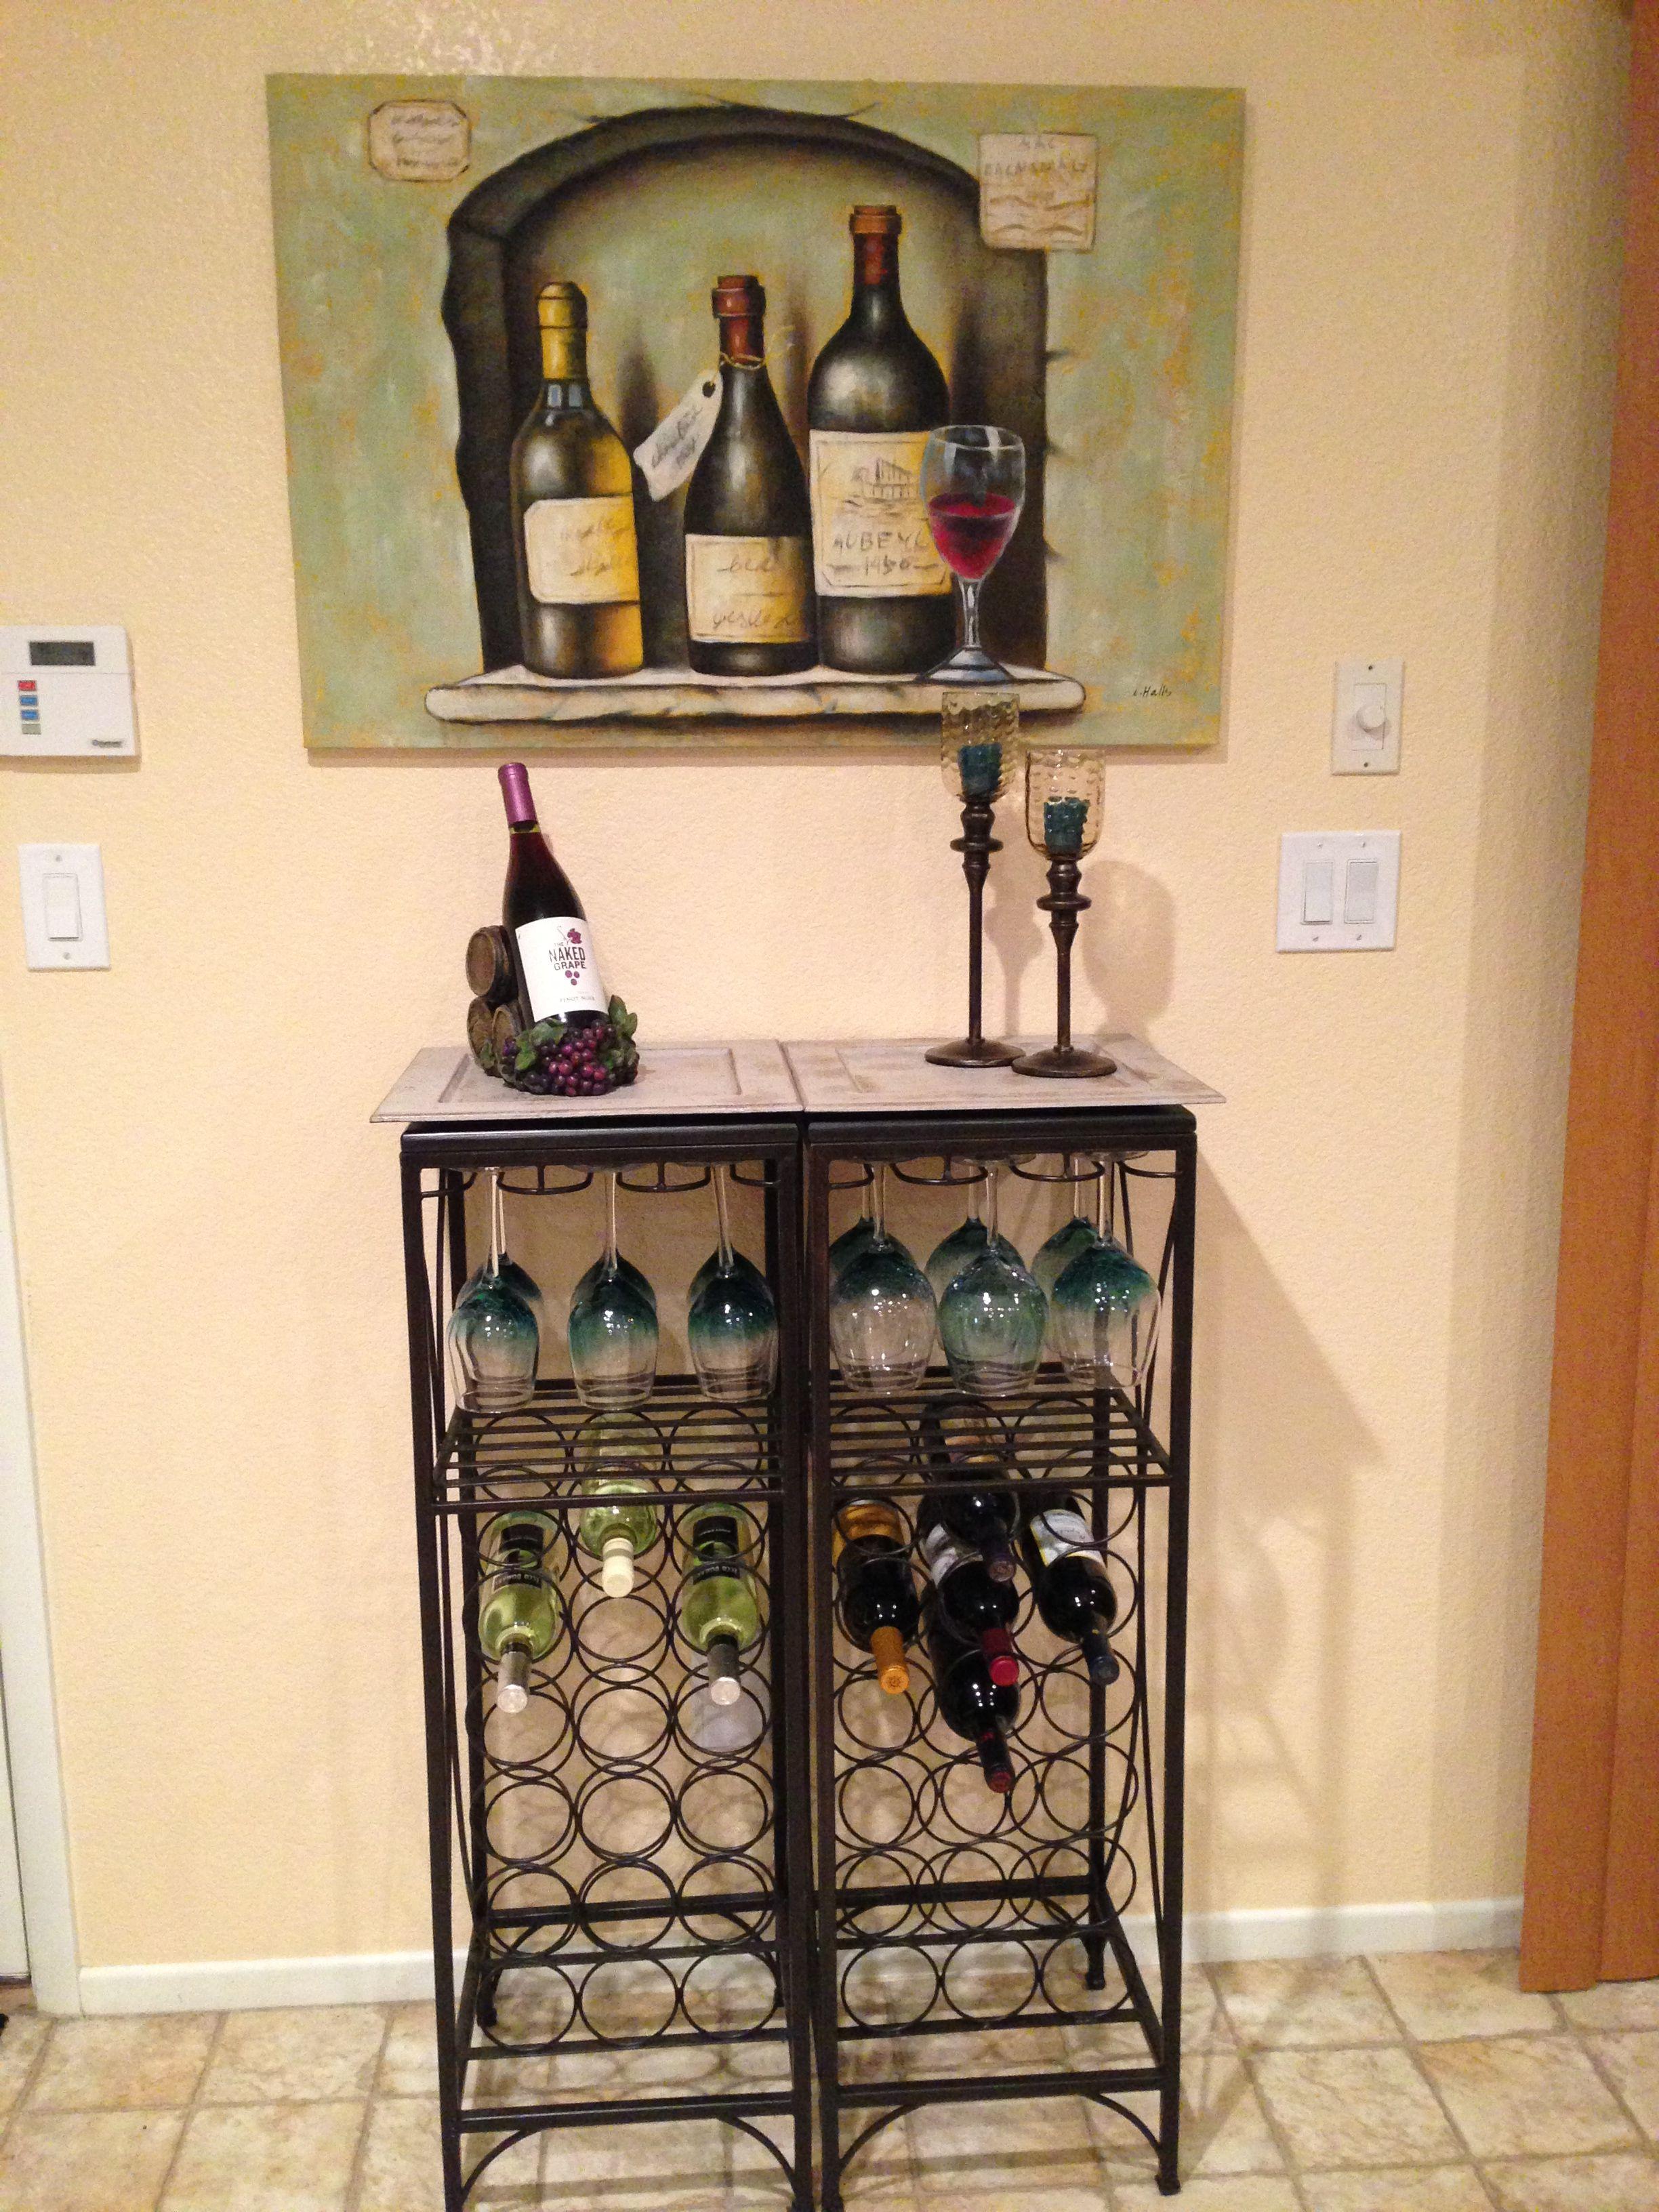 Double iron rod, granite top designed wine rack ... In love ...